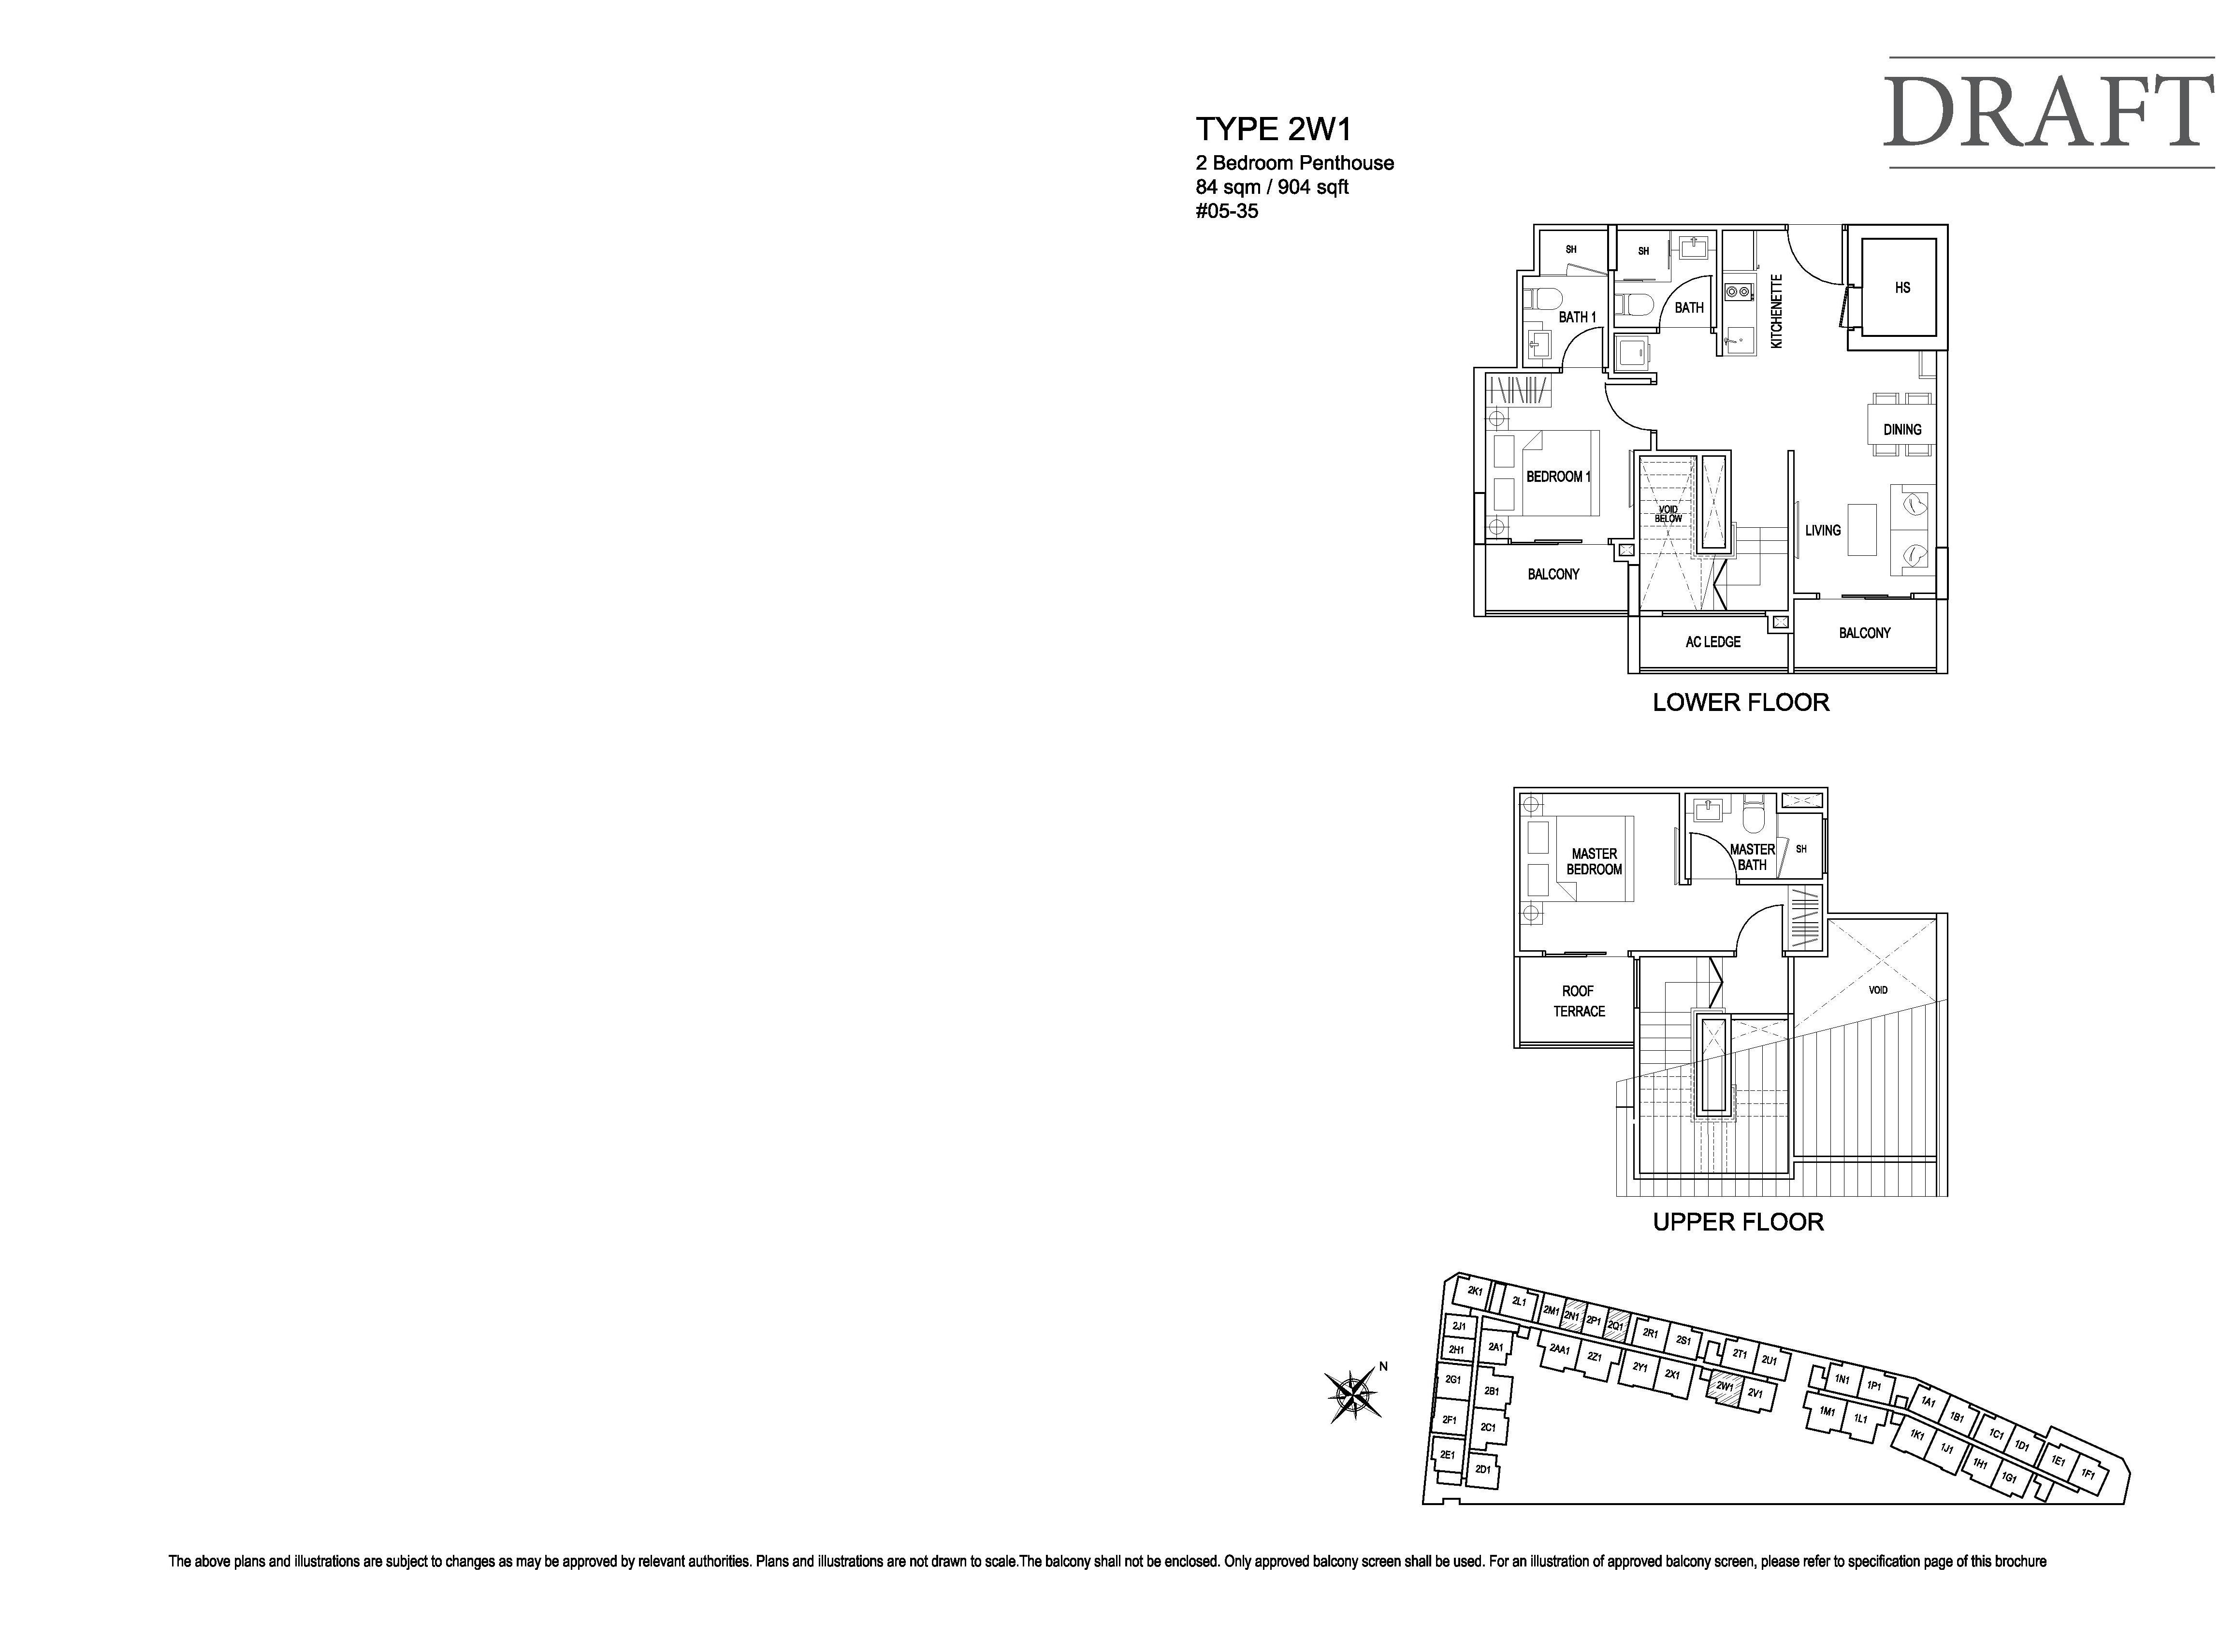 Kensington Square 2 Bedroom Penthouse Floor Plans Type 2W1